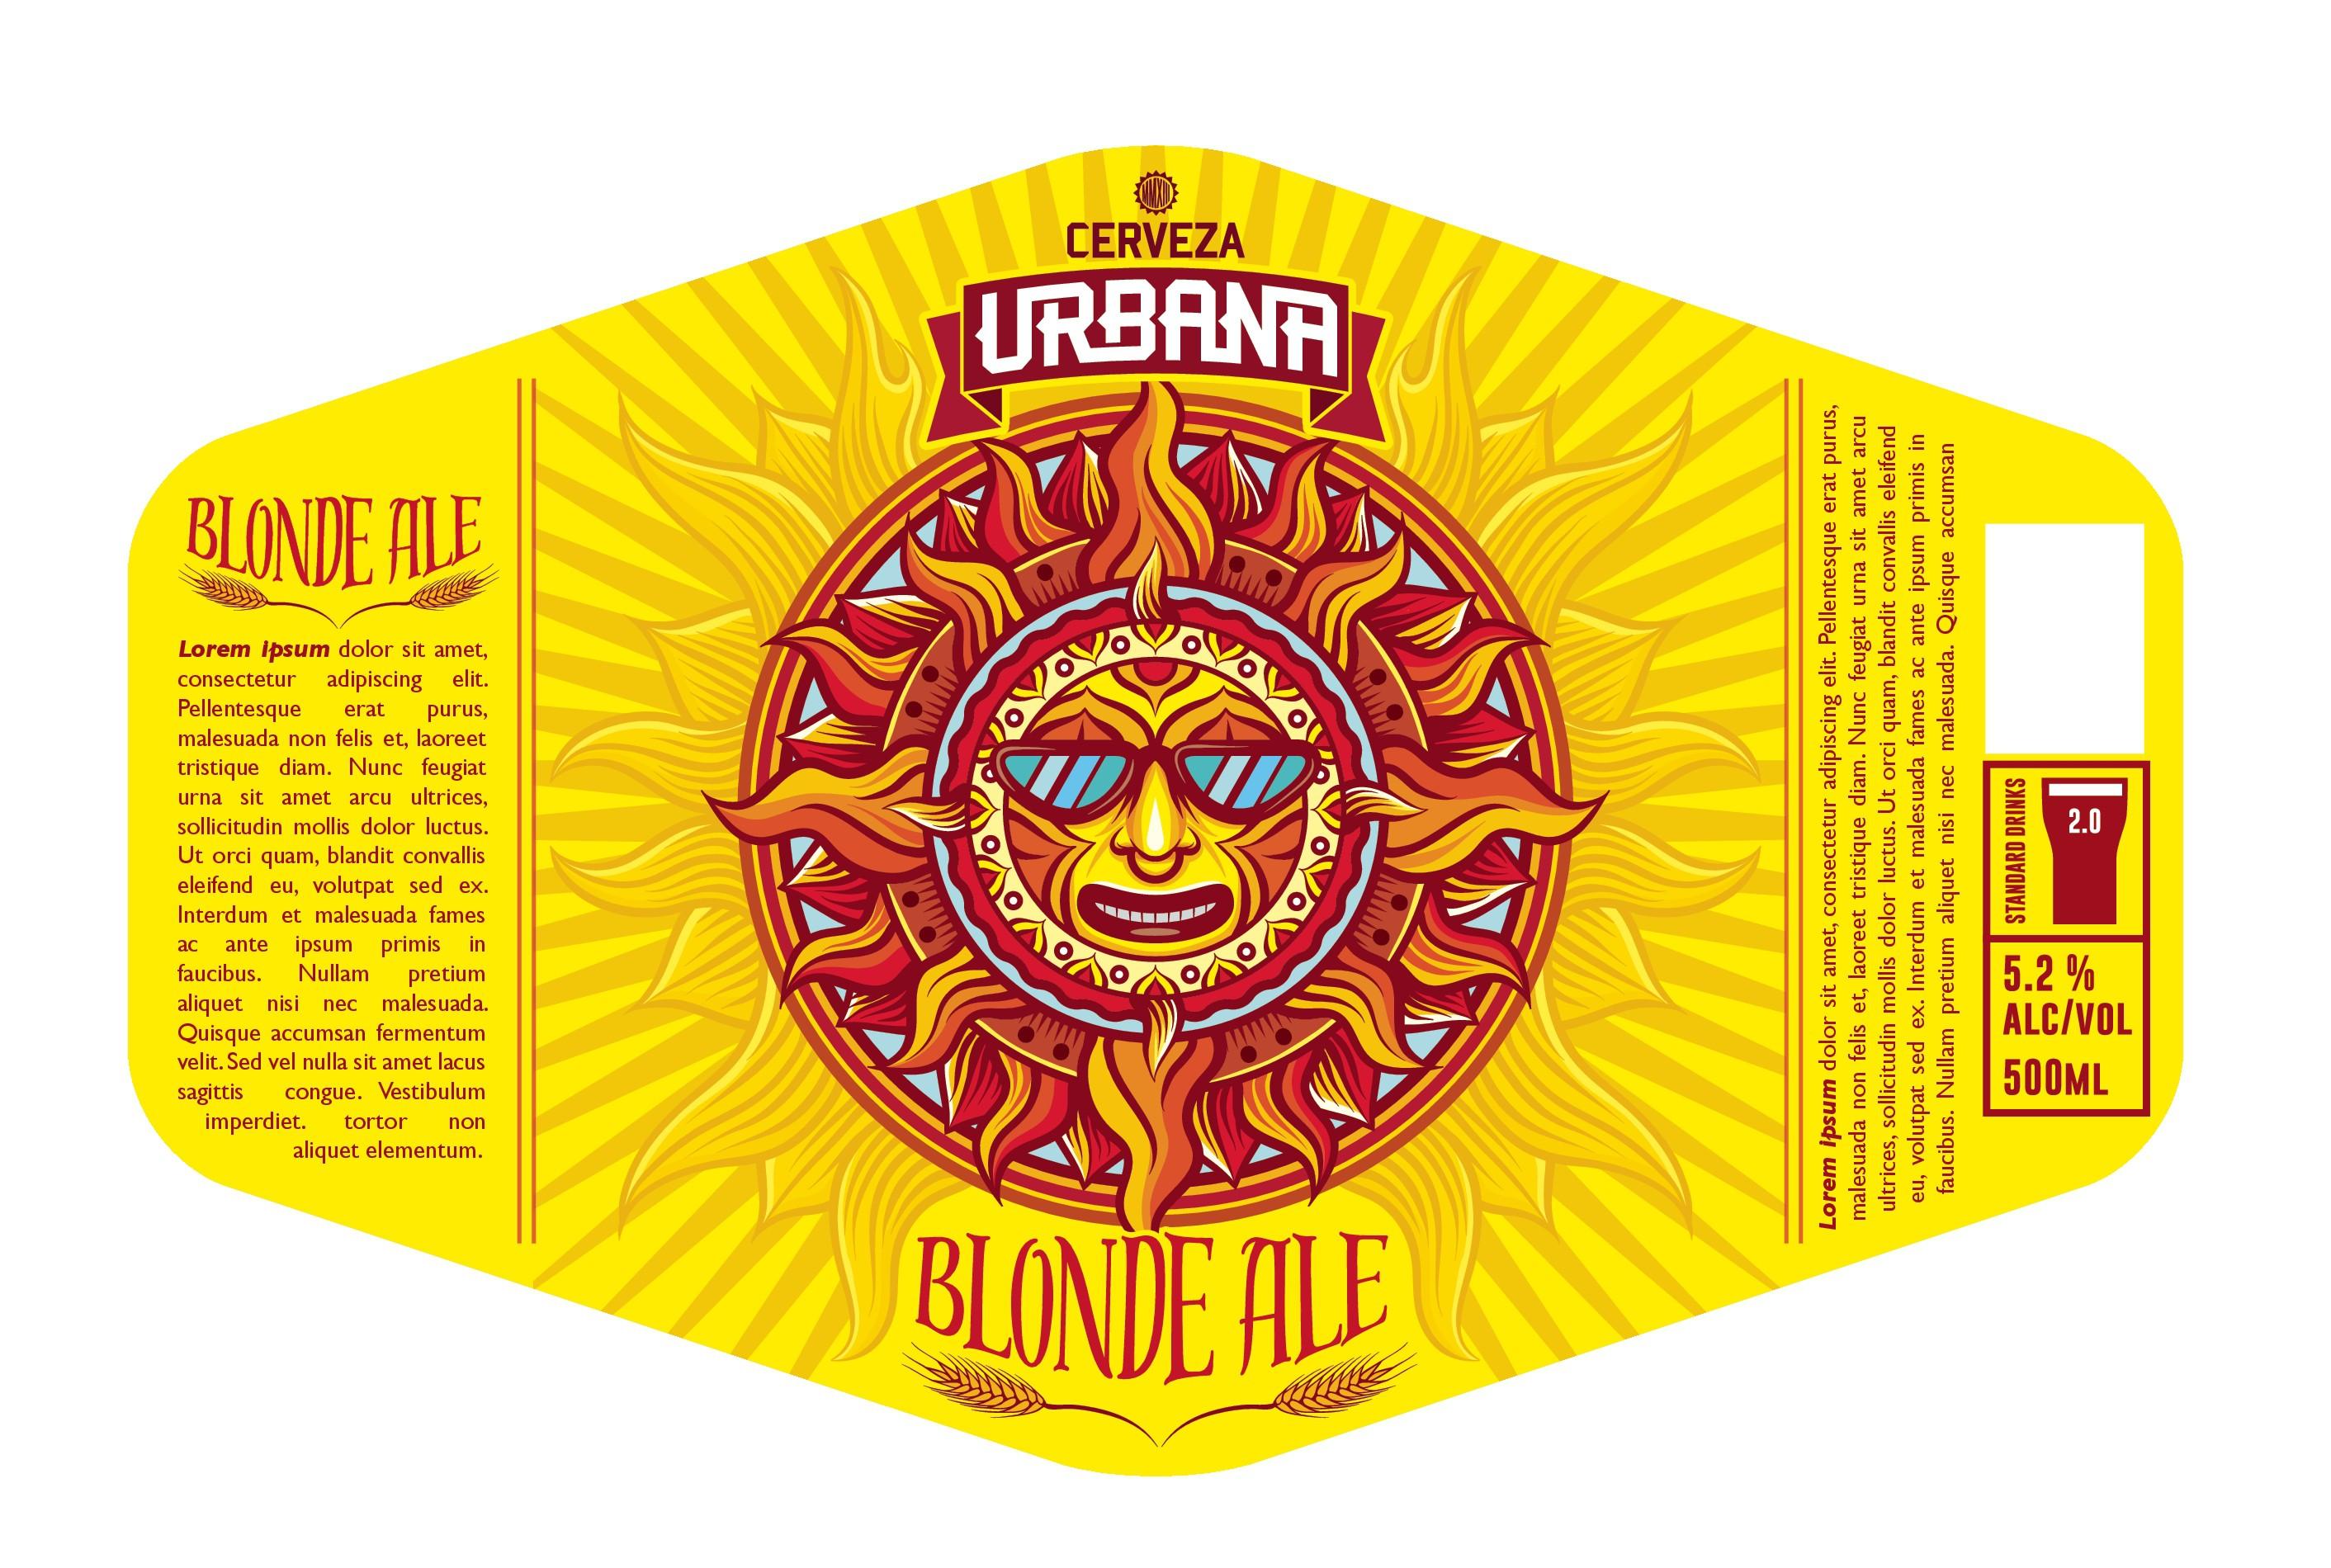 Urbana Beer Bottle Labels